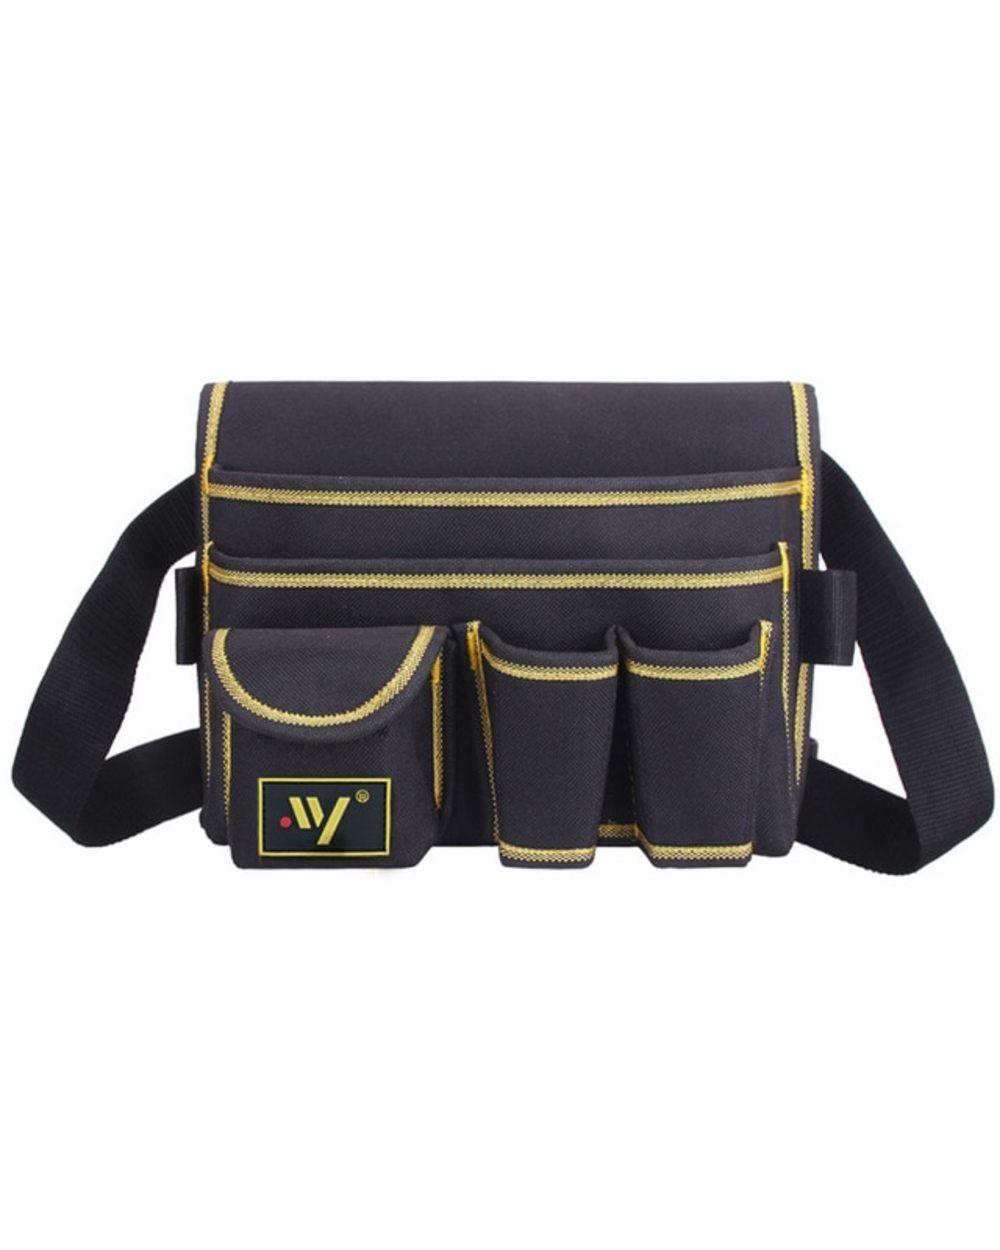 Multi-function Waist Pack Repair Bag: Best Tool Bag for Electricians  template